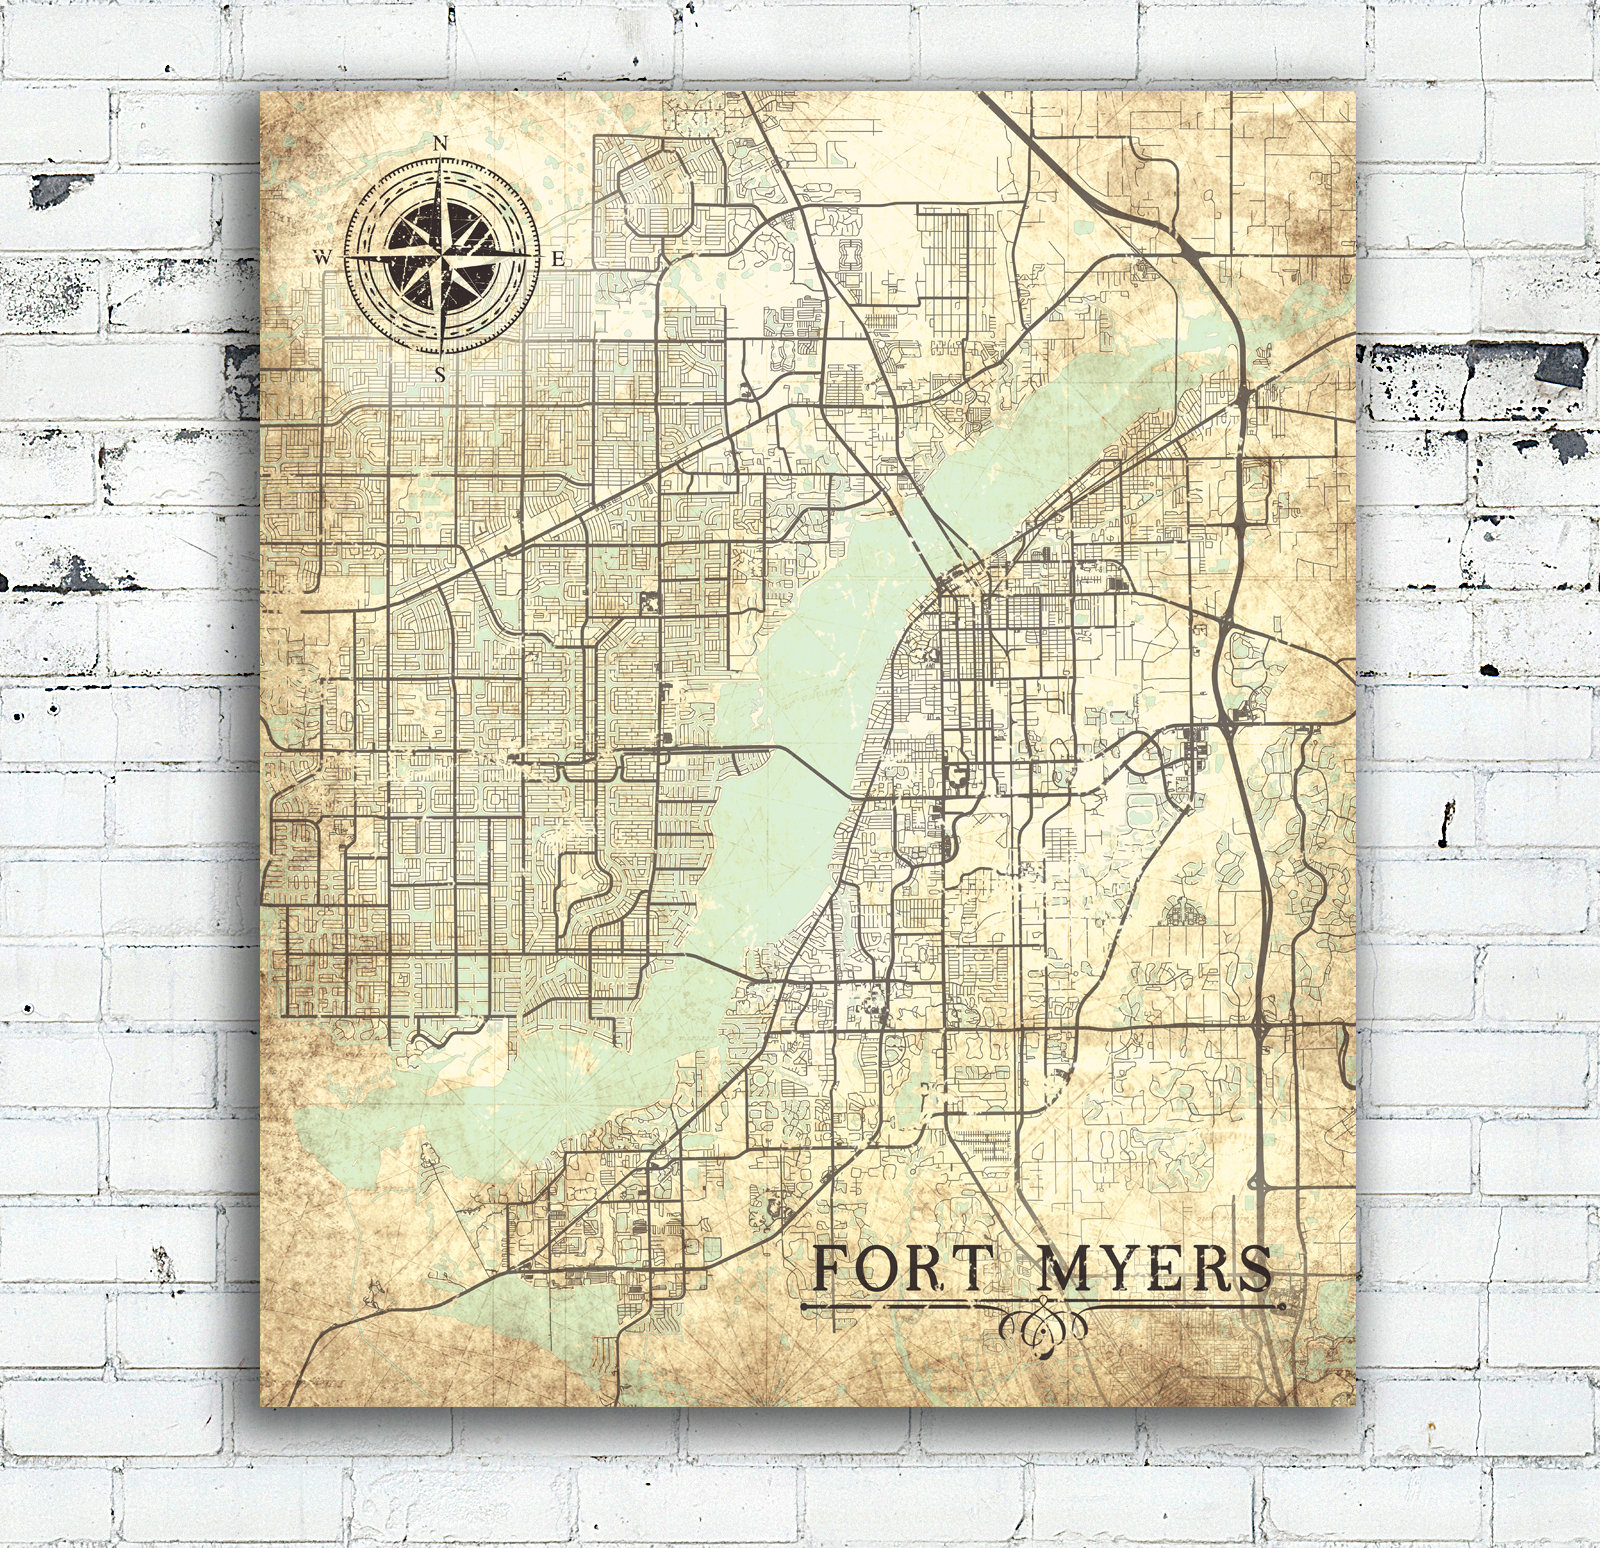 Fort Myers Fl Canvas Print Florida Vintage Map Fort Myers Vintage - Old Florida Maps Prints